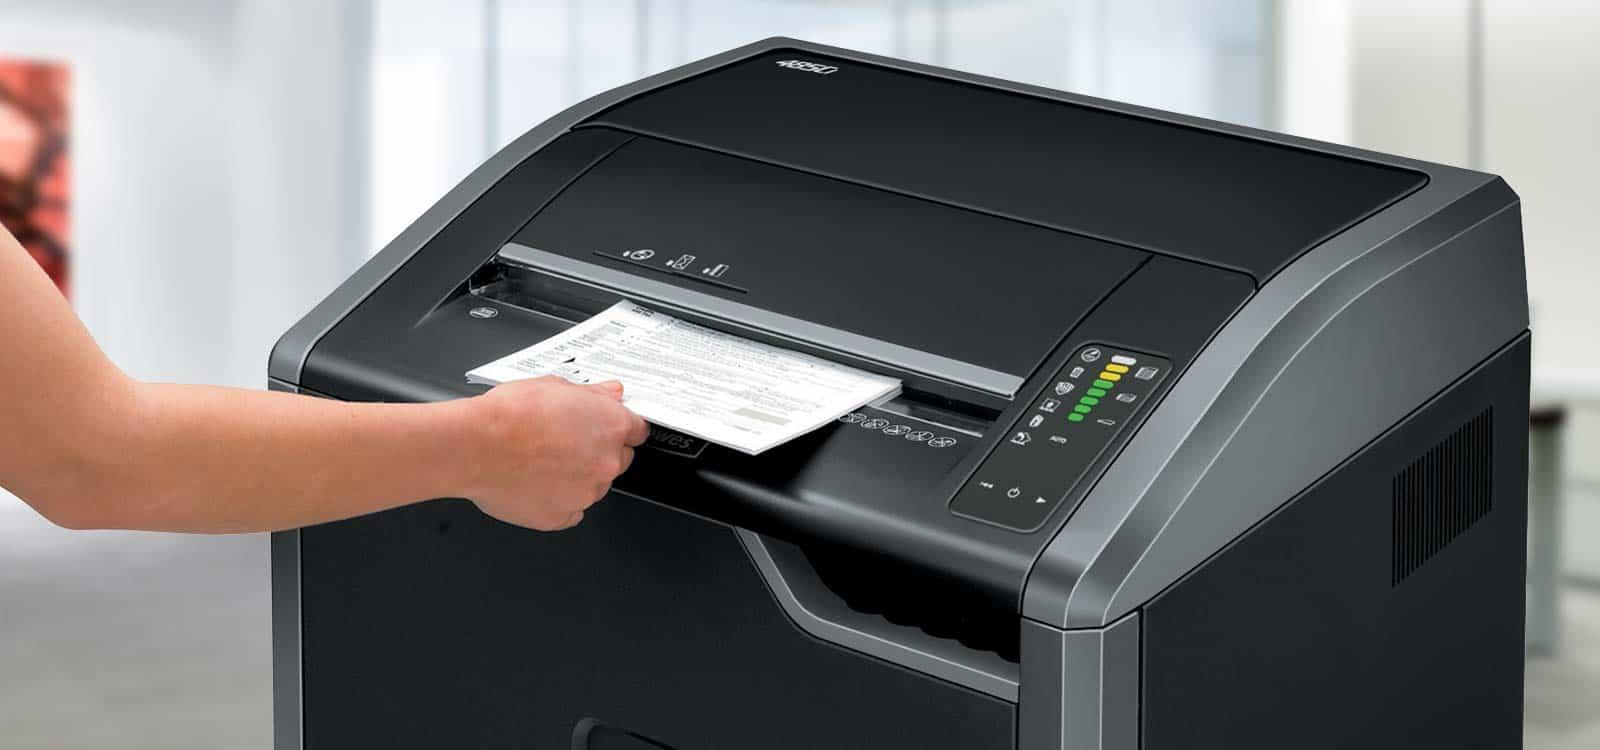 taa-compliant-paper-shredder-nsa